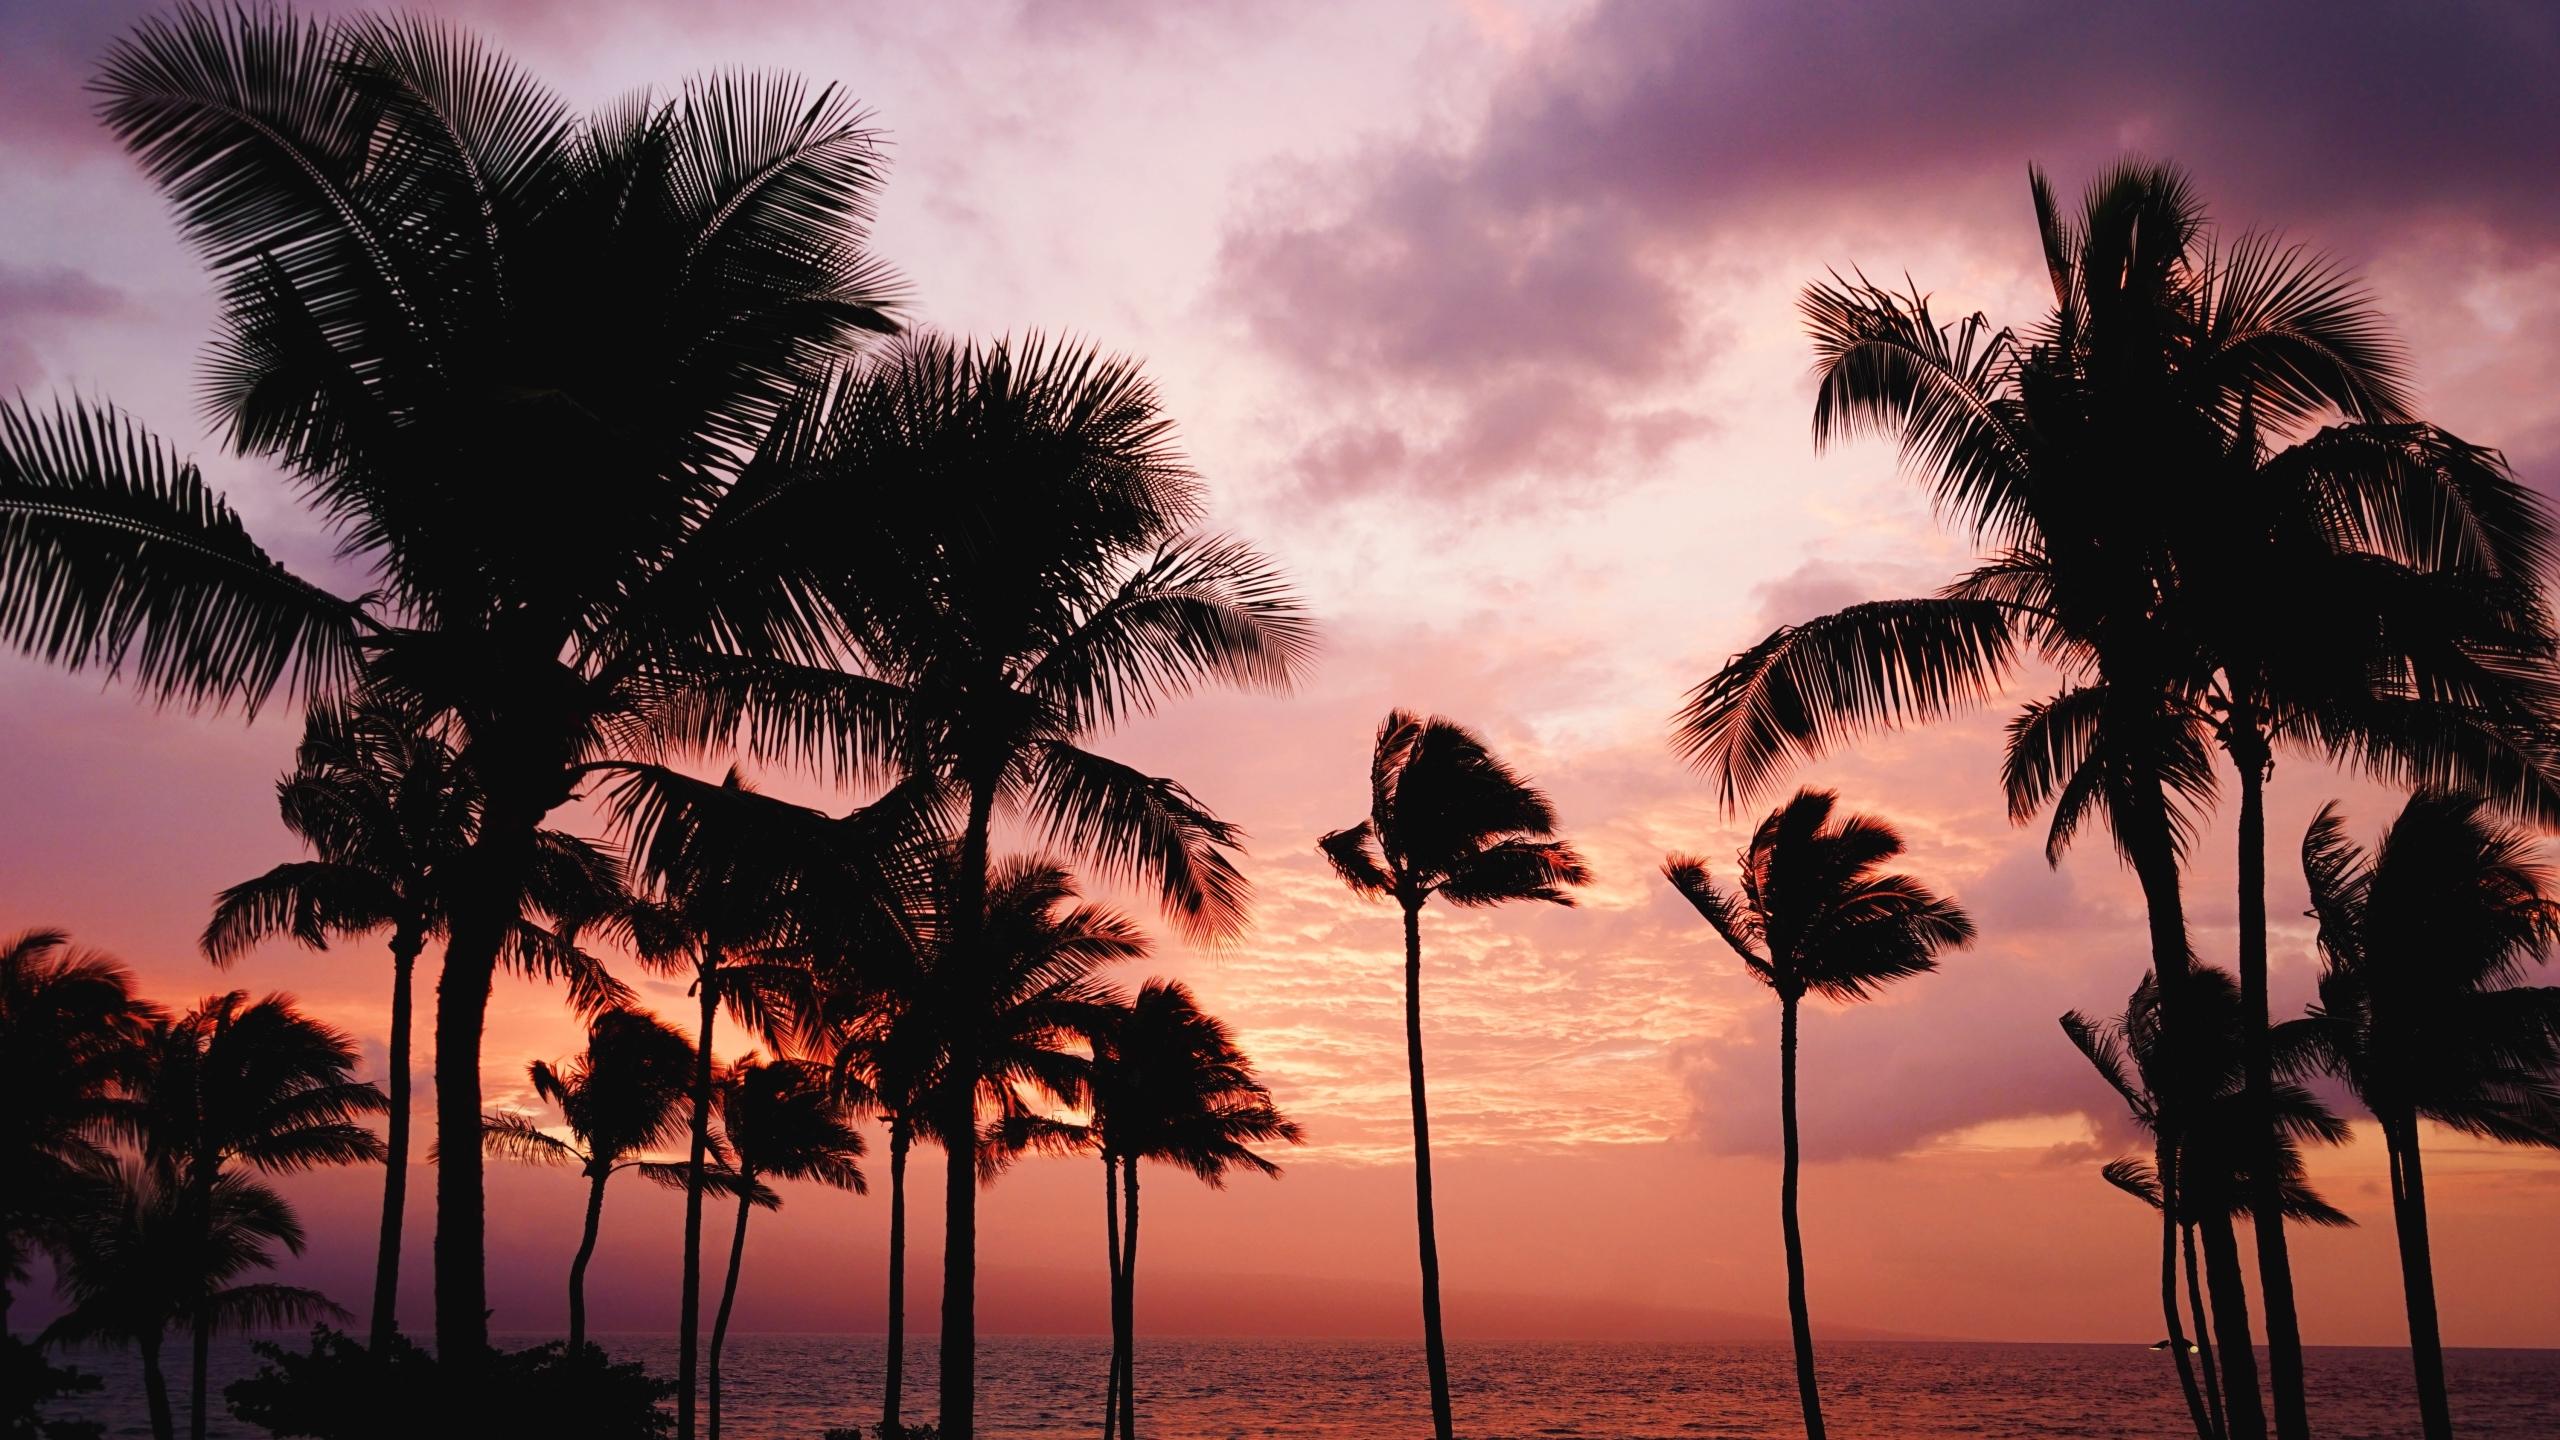 2560x1440 palm trees, sunset, sea 1440P